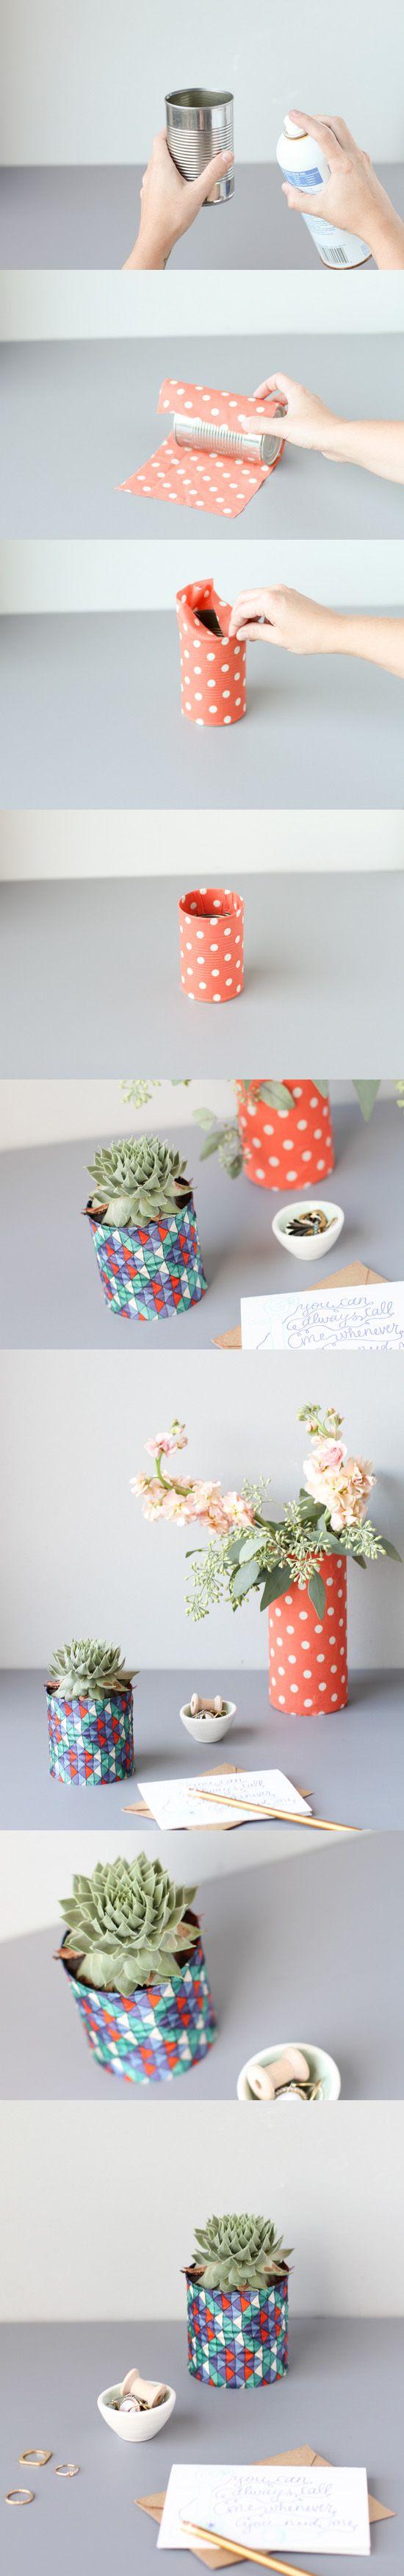 Recipientes decorativos con latas recicladas / vía http://www.papernstitchblog.com/